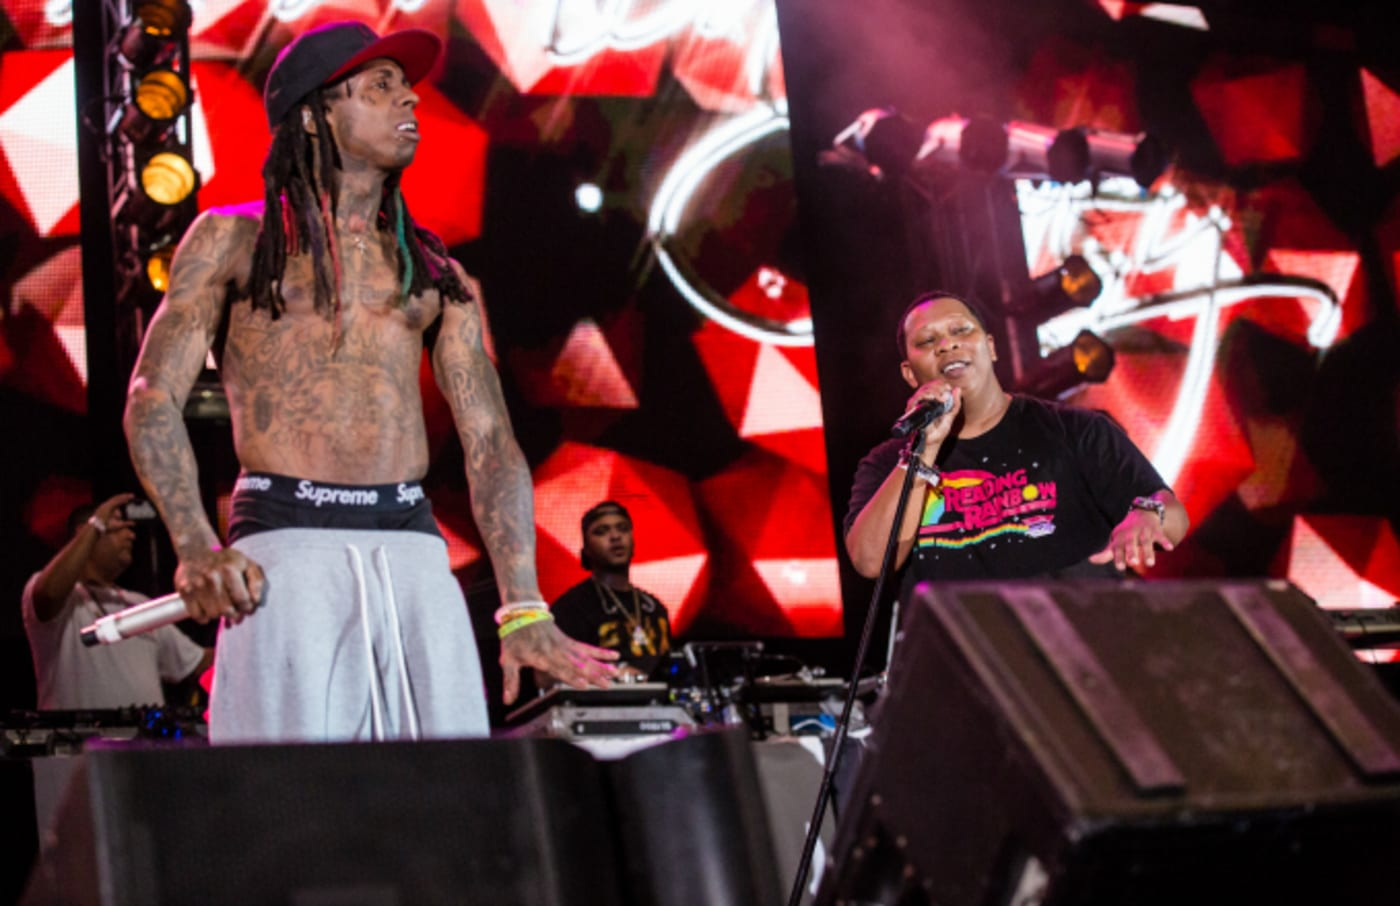 Lil Wayne (L) and Mannie Fresh perform at Lil Weezyana Festival